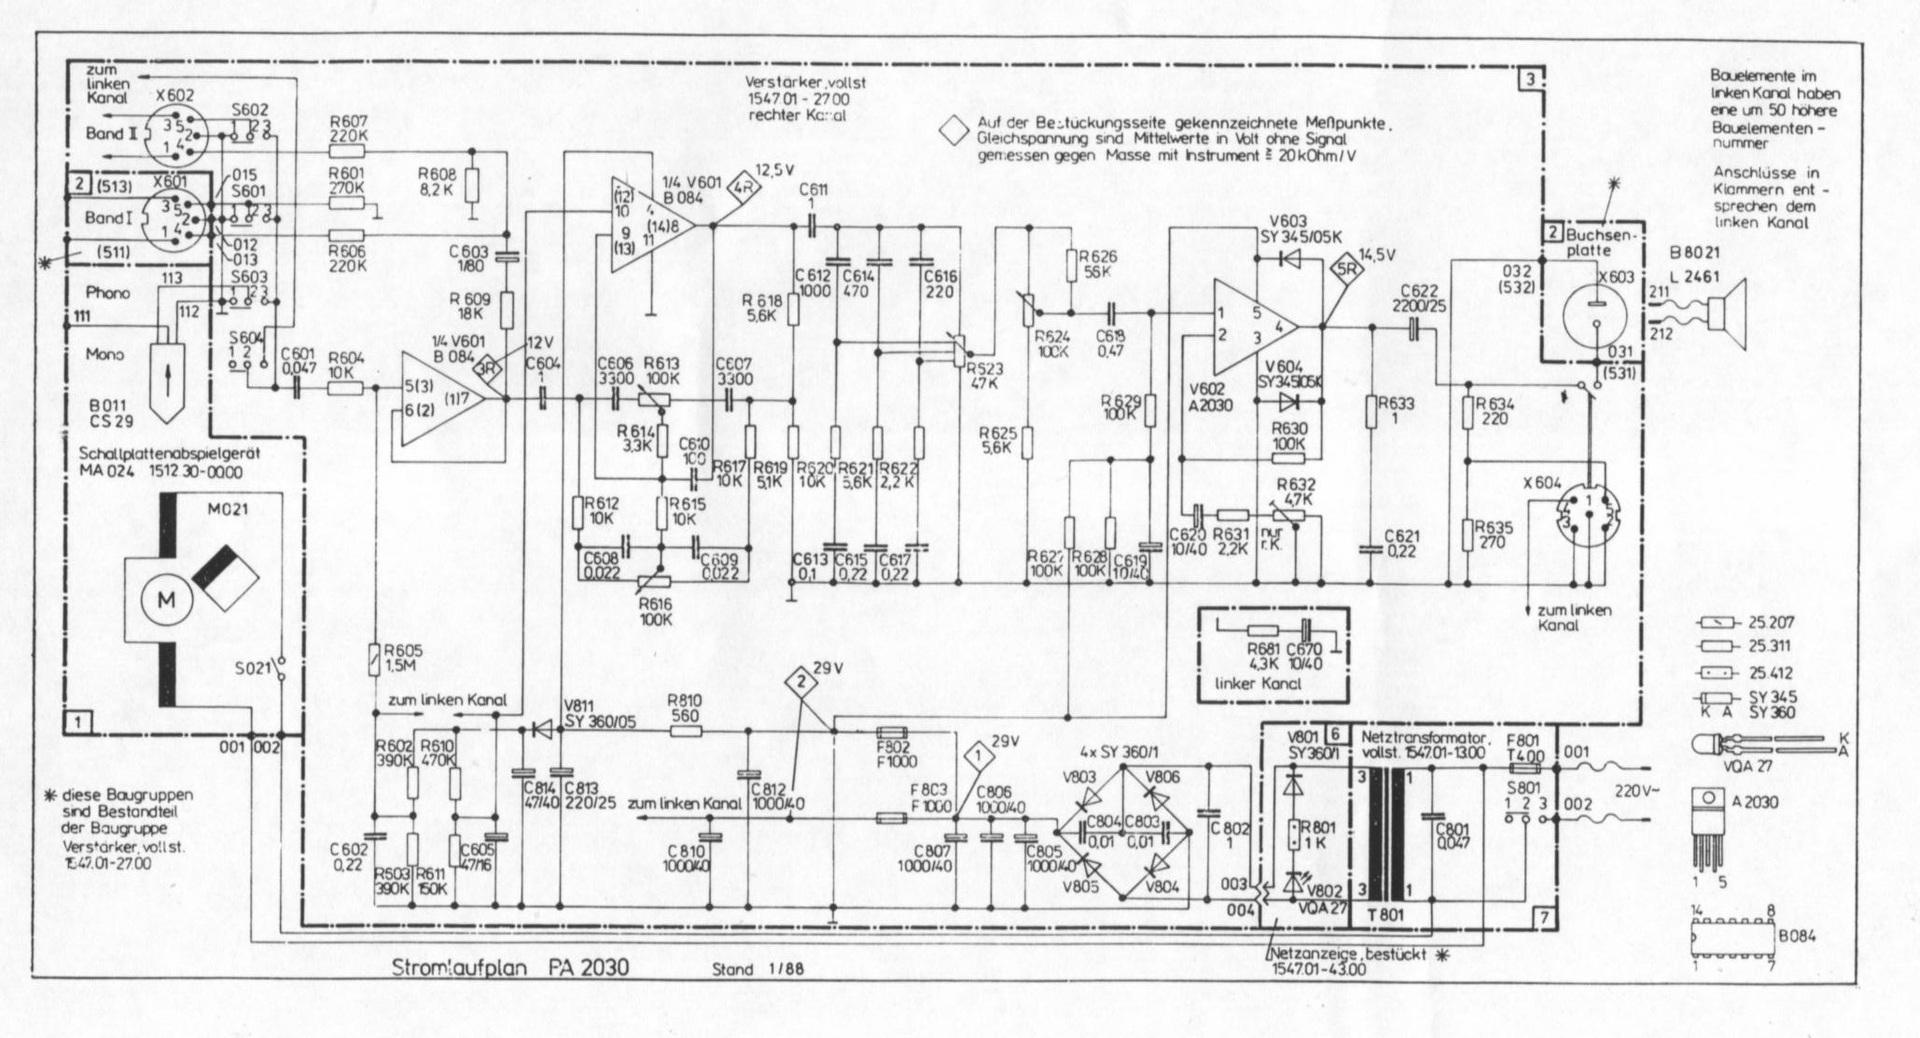 RFT PA 2030 - Verstärker defekt?, Hifi-Klassiker - HIFI-FORUM